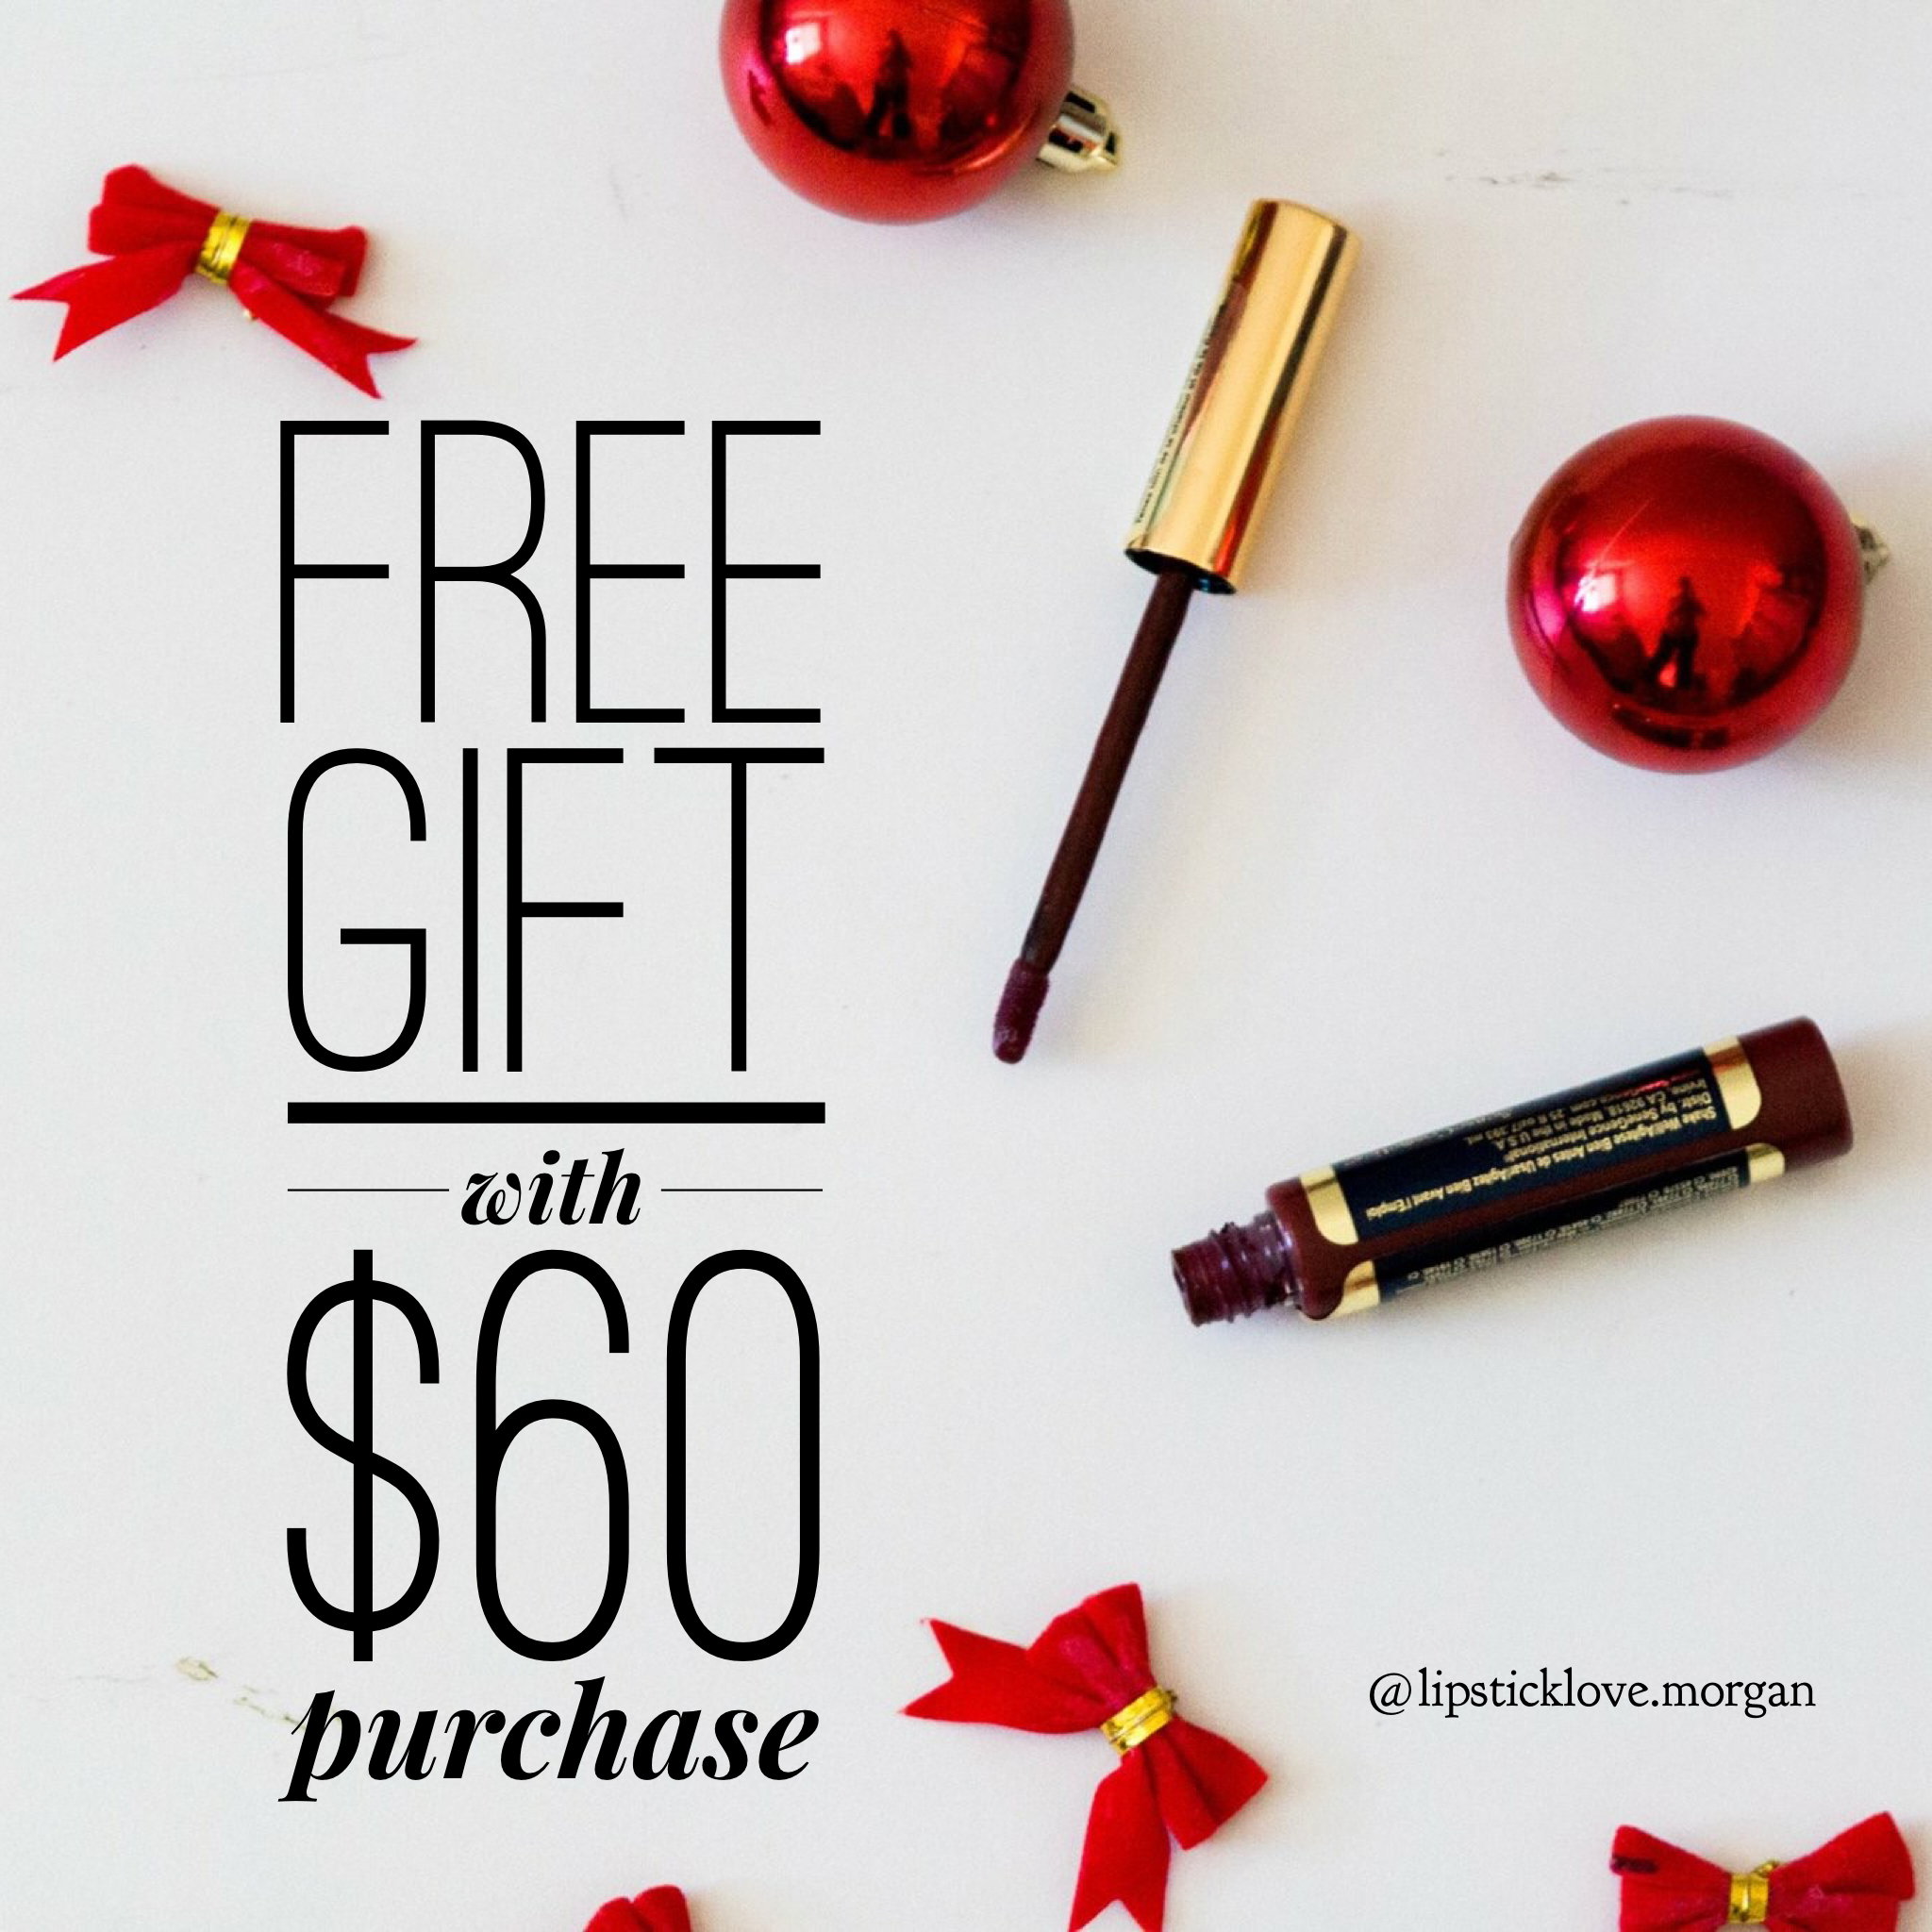 Free Gift Lipsense Lipstick Christmas Deals Black Friday Savings